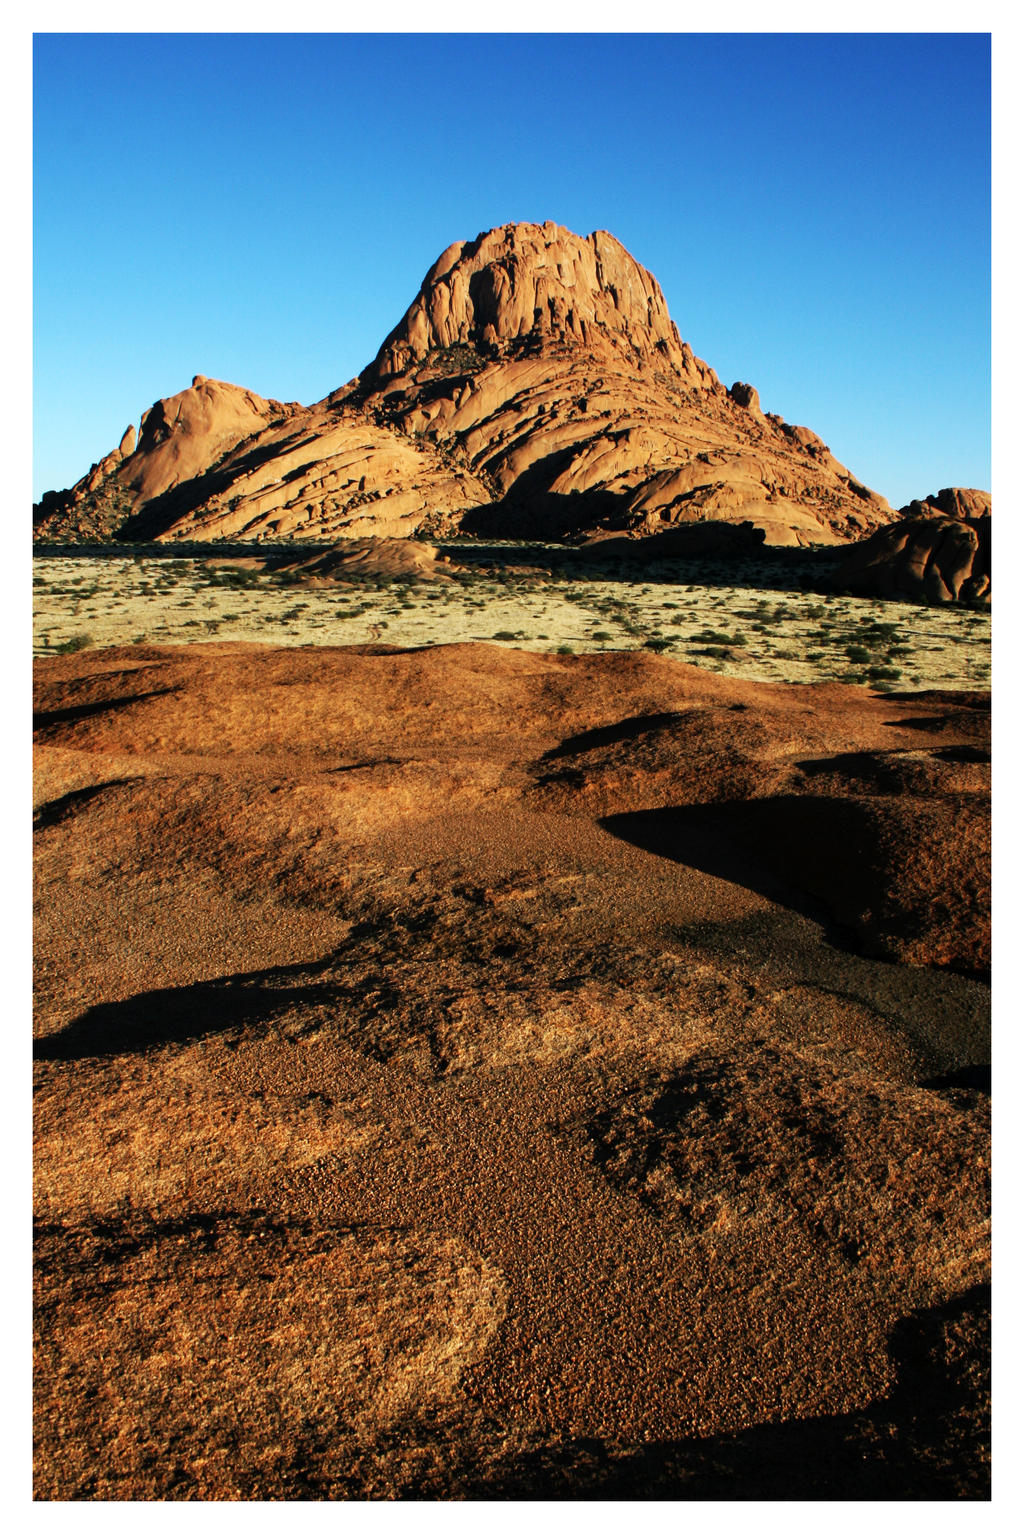 Spitzkoppe Terrain by ElSpaZo